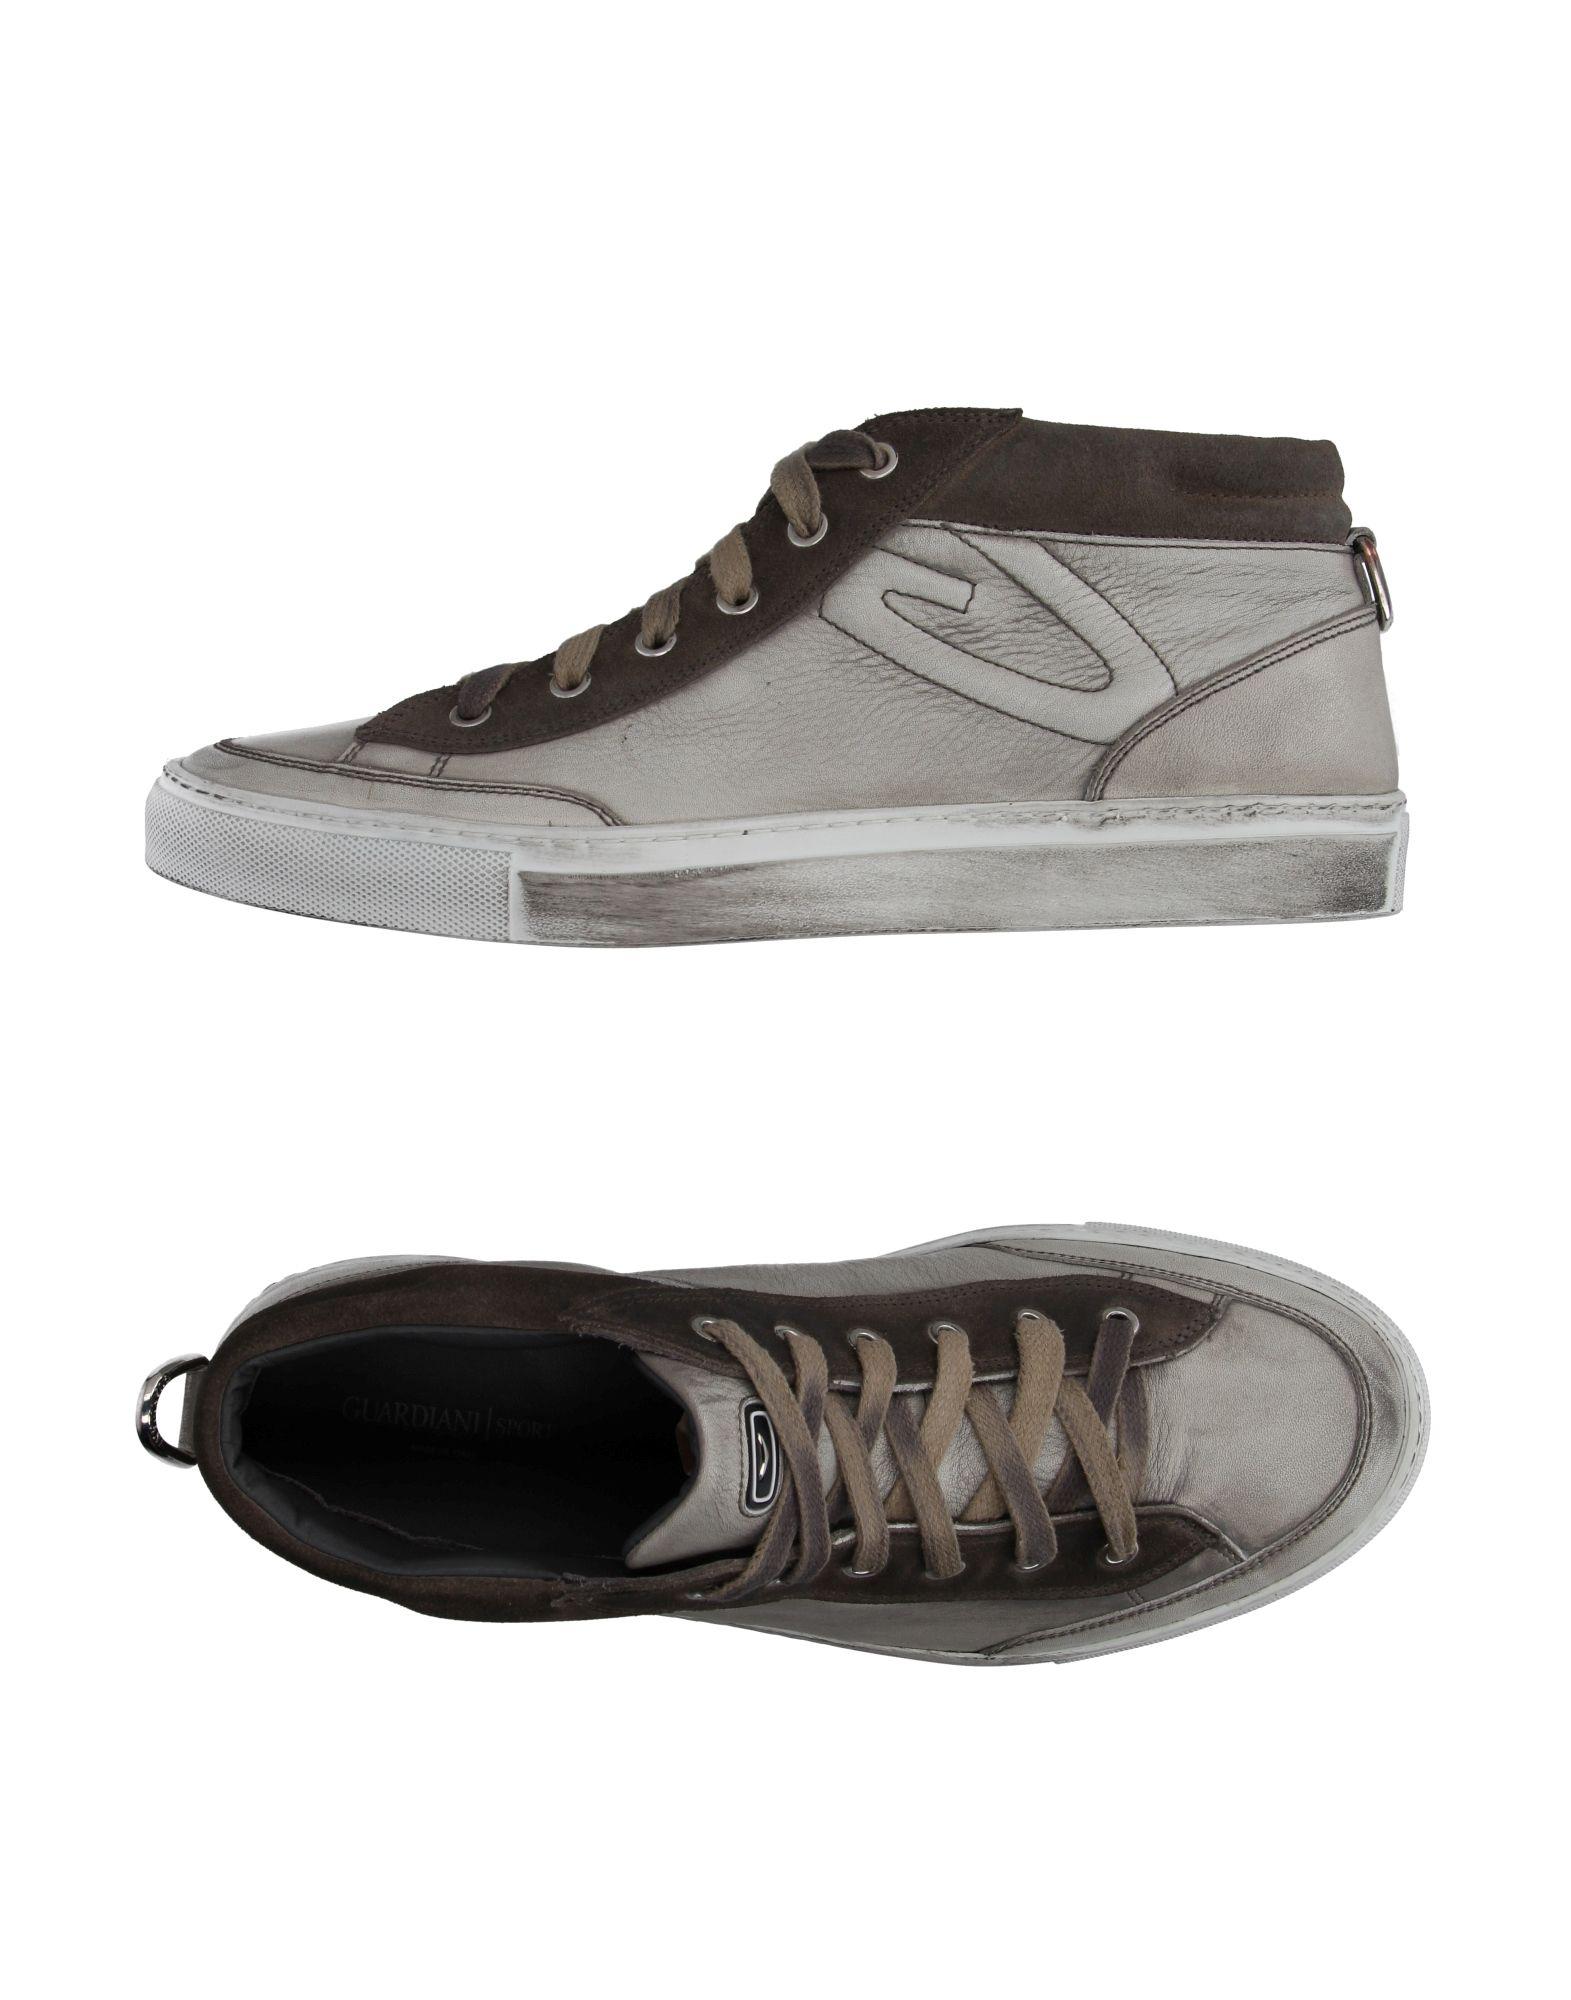 Rabatt Schuhe echte Schuhe Rabatt Alberto Guardiani Sneakers Herren  11059070PQ 274ad5